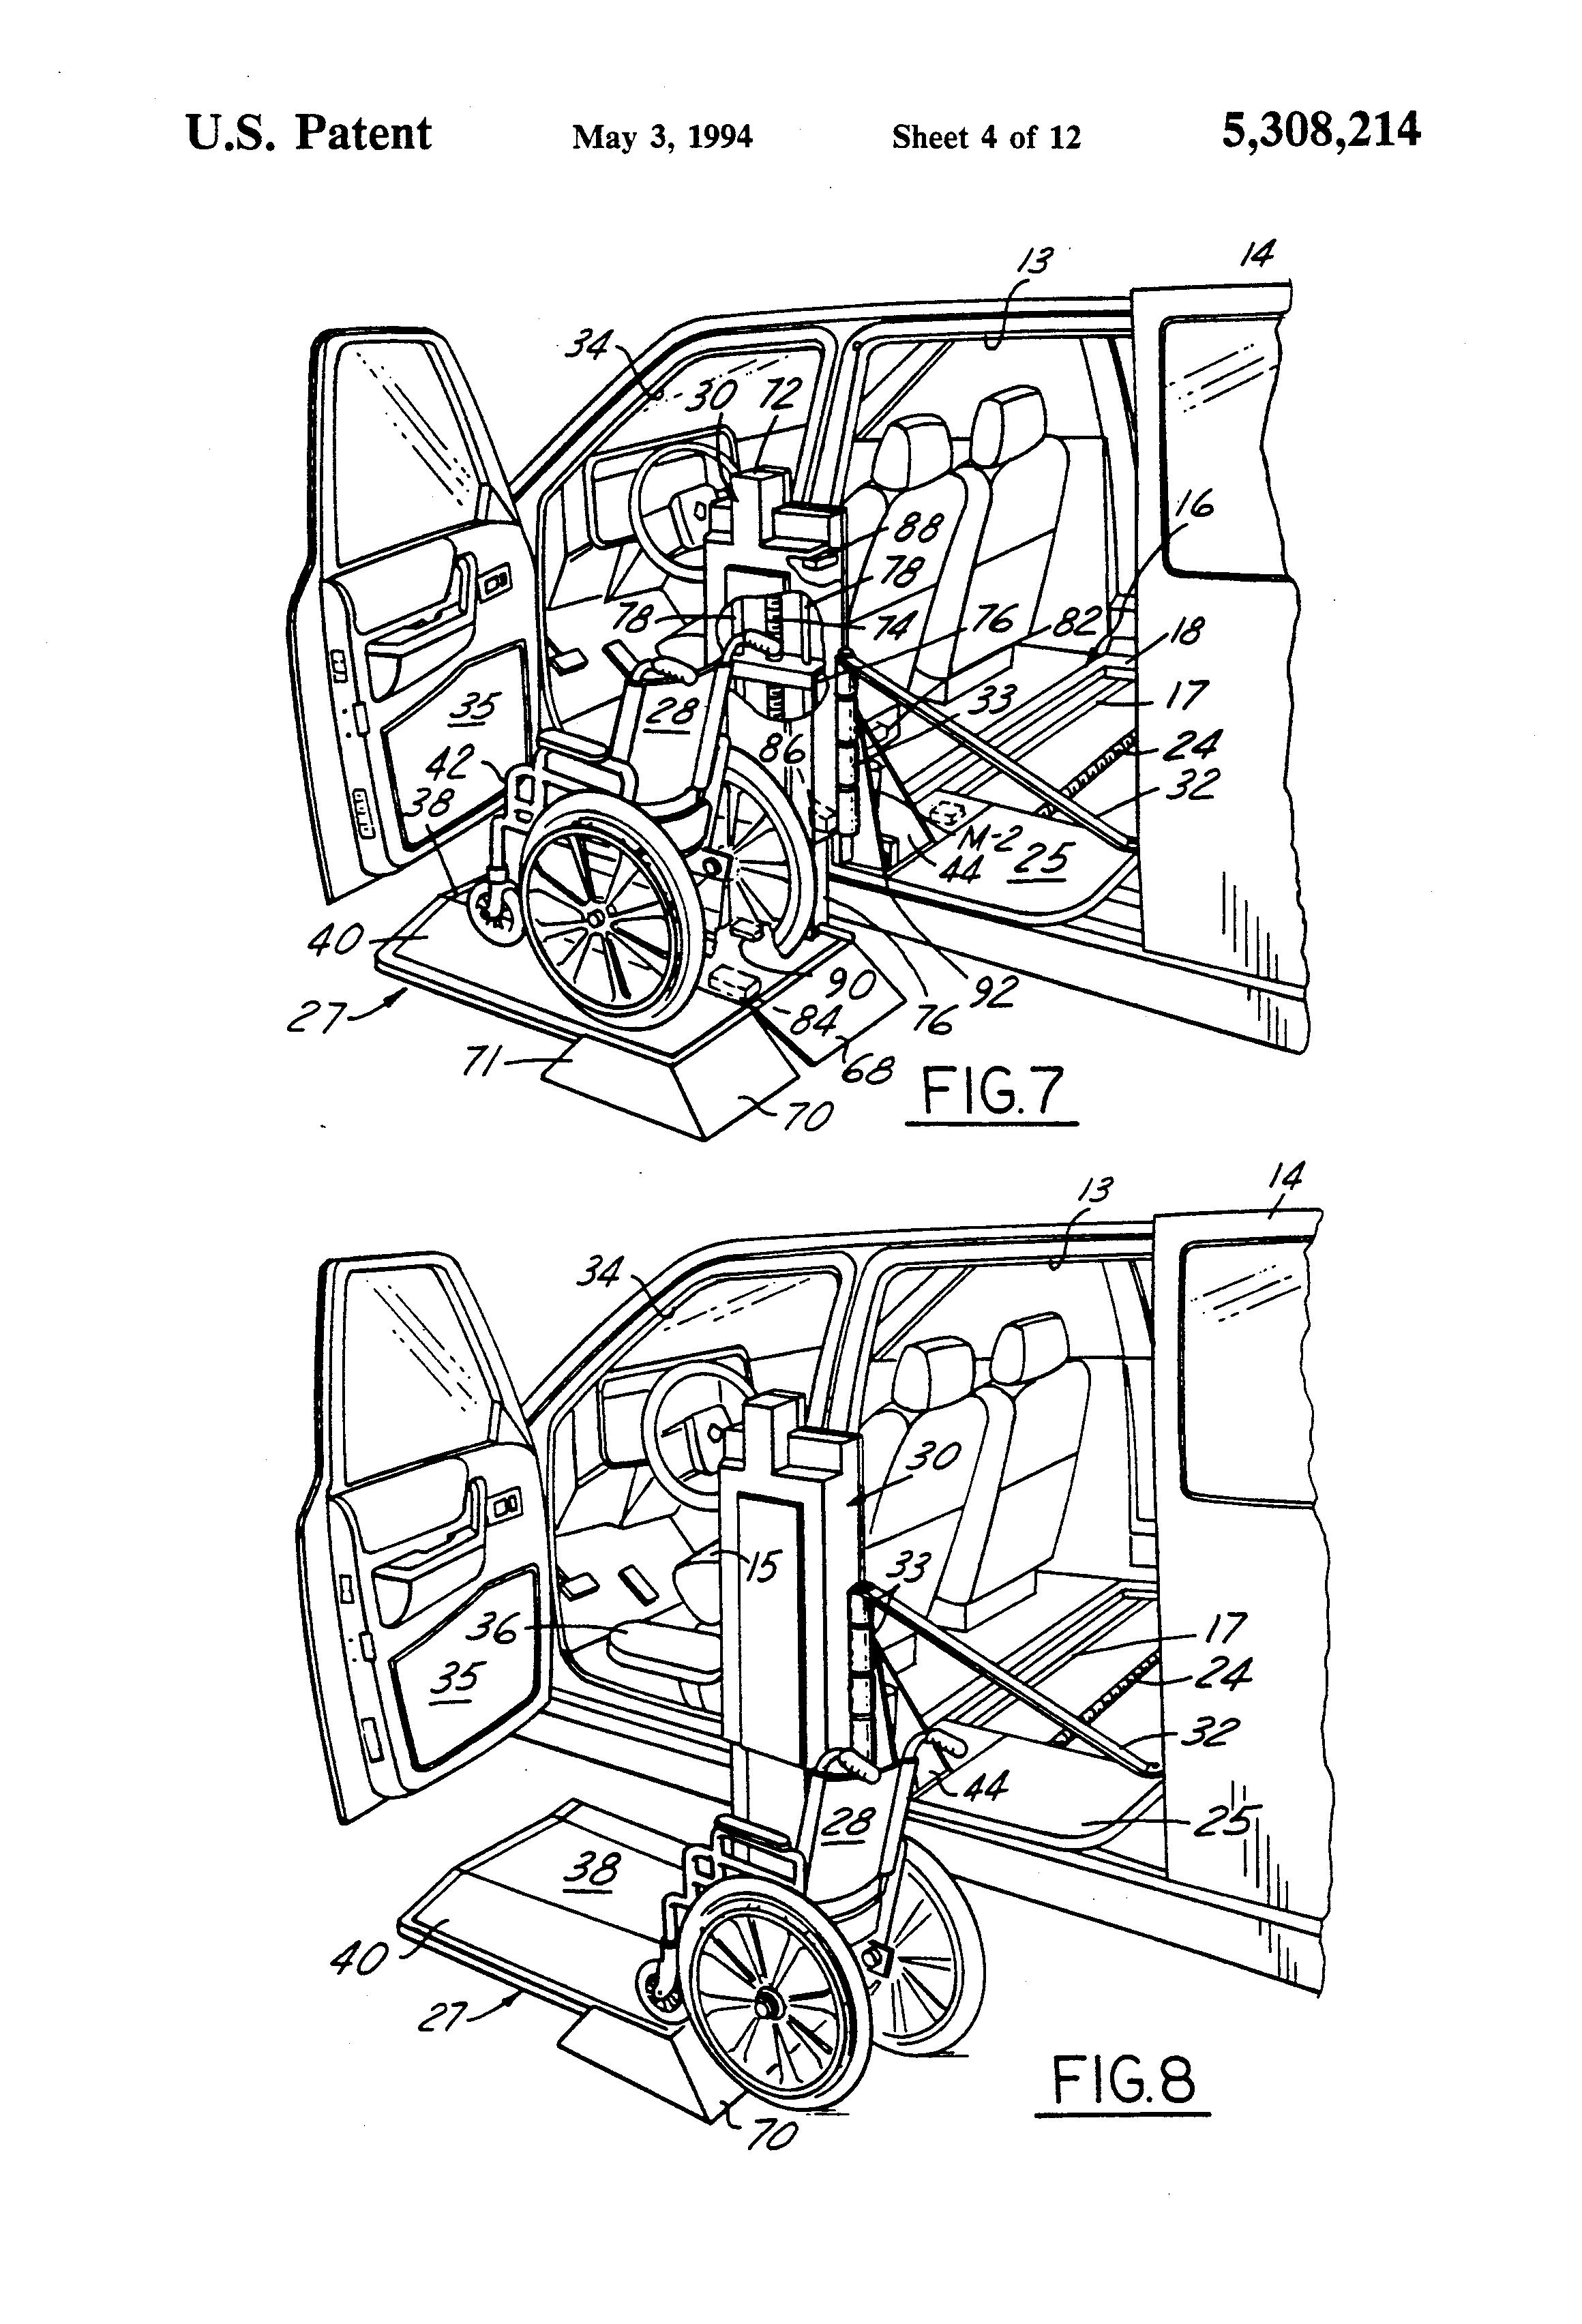 1985 Honda Vt700 Wiring Diagram - wiring diagrams